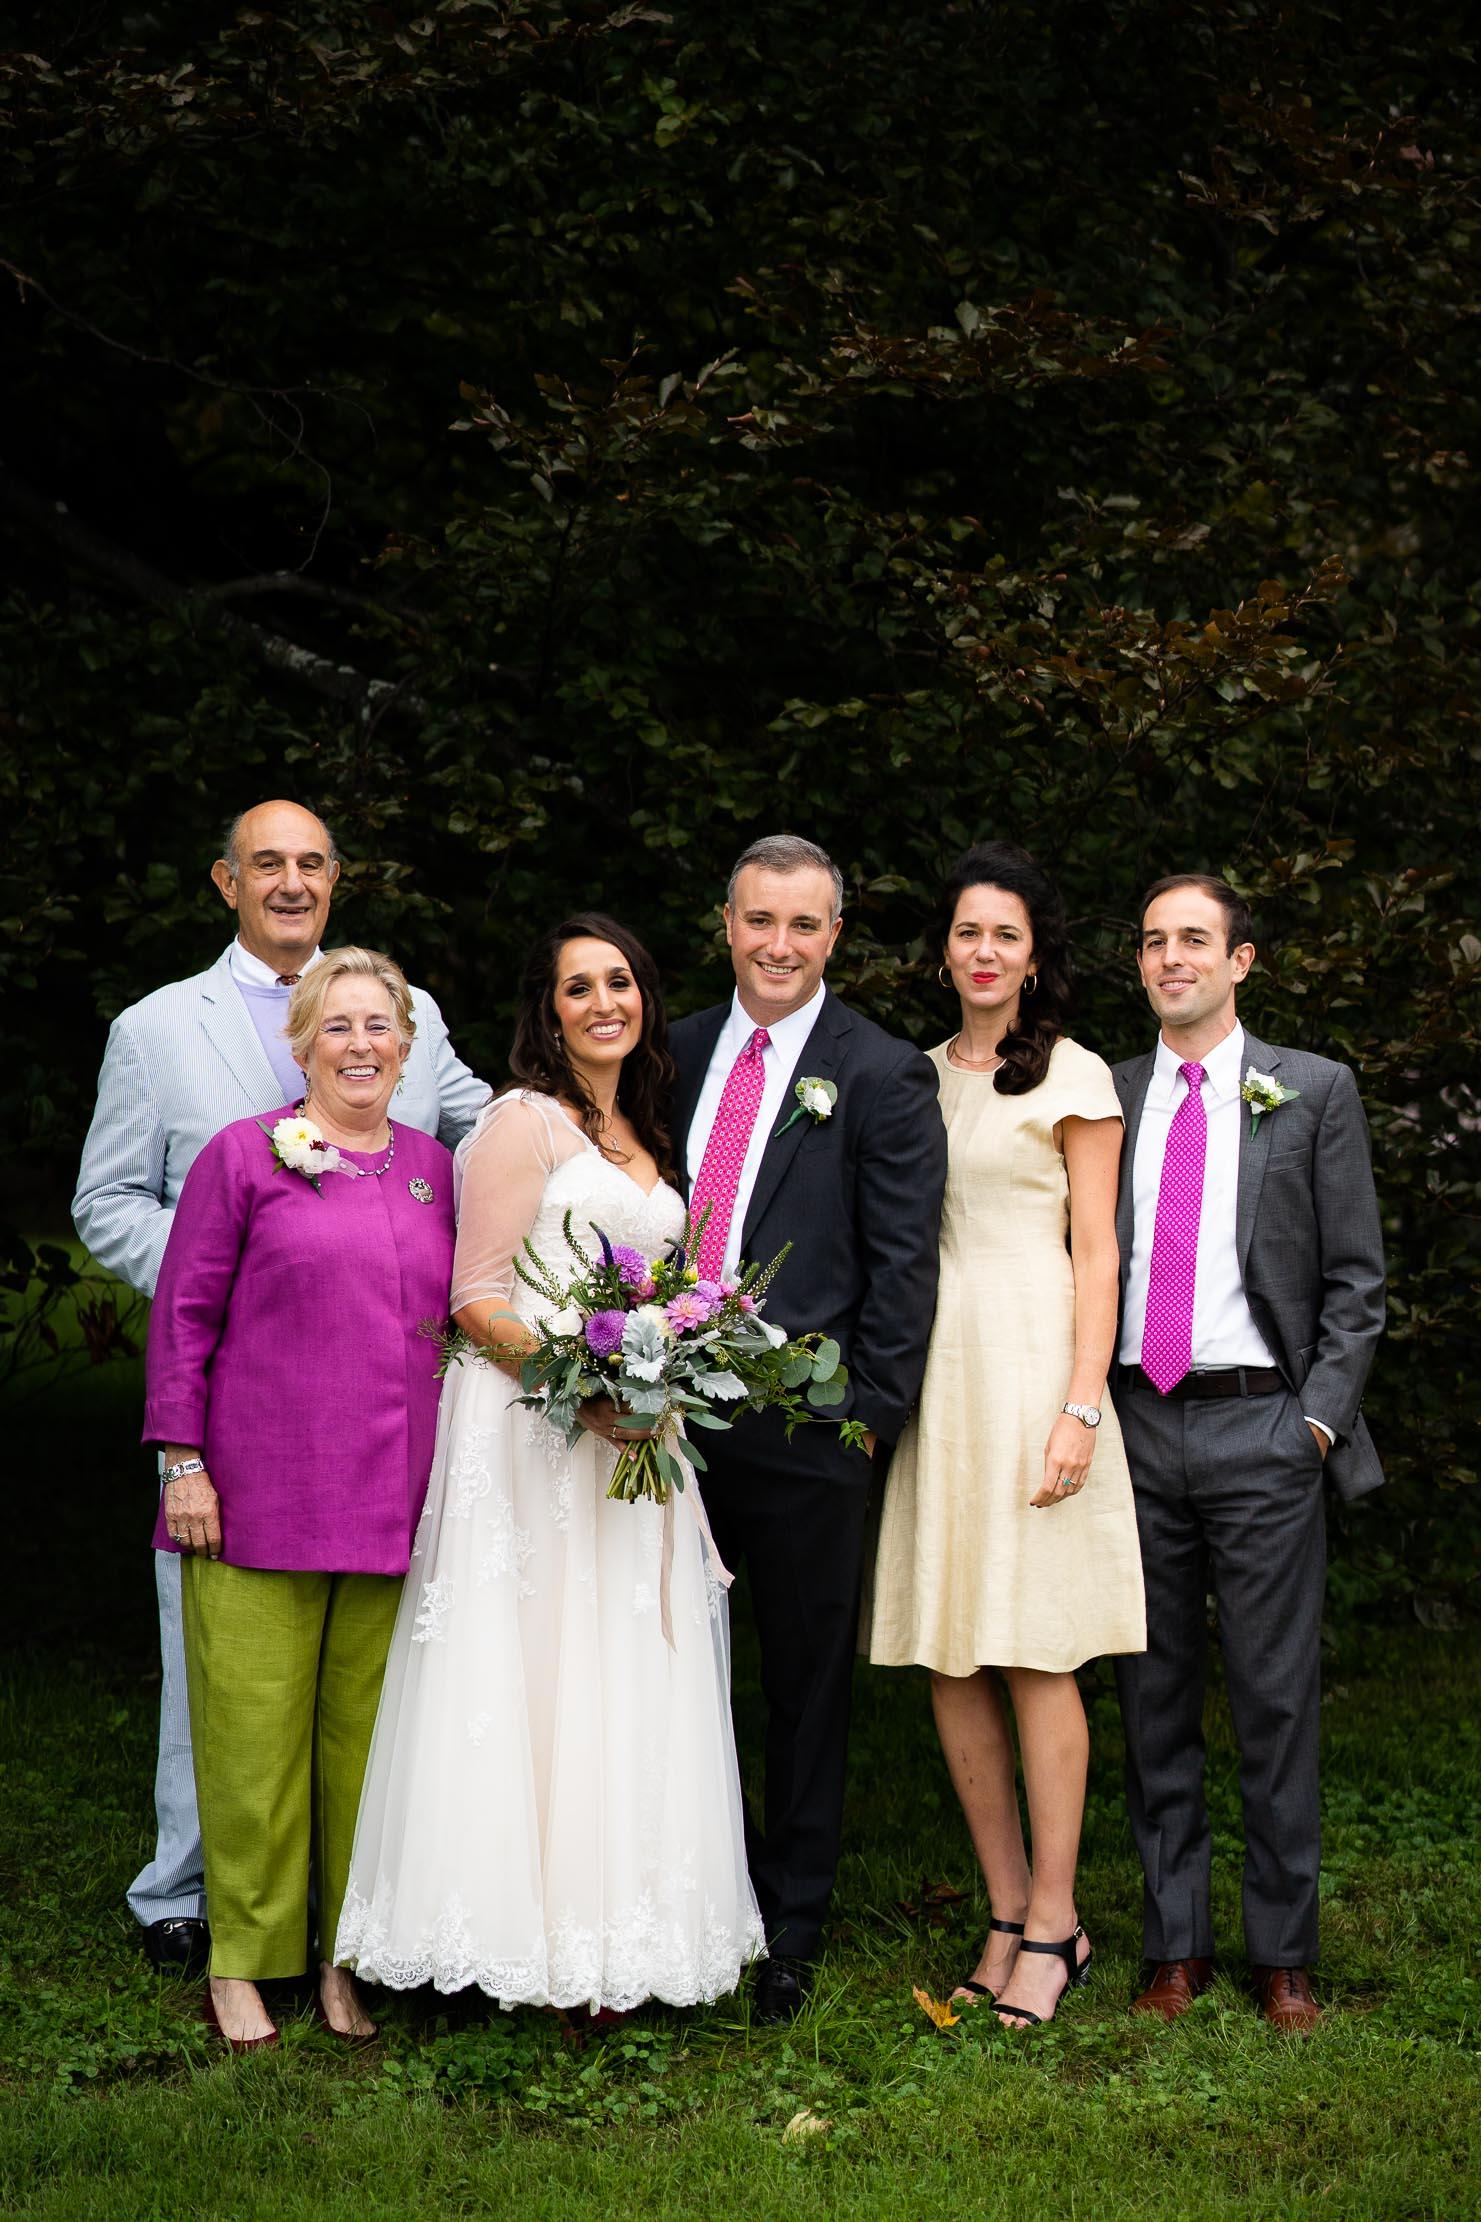 Wings-Castle-Millbrook-NY-Upstate-Wedding-Photographer-1039.jpg